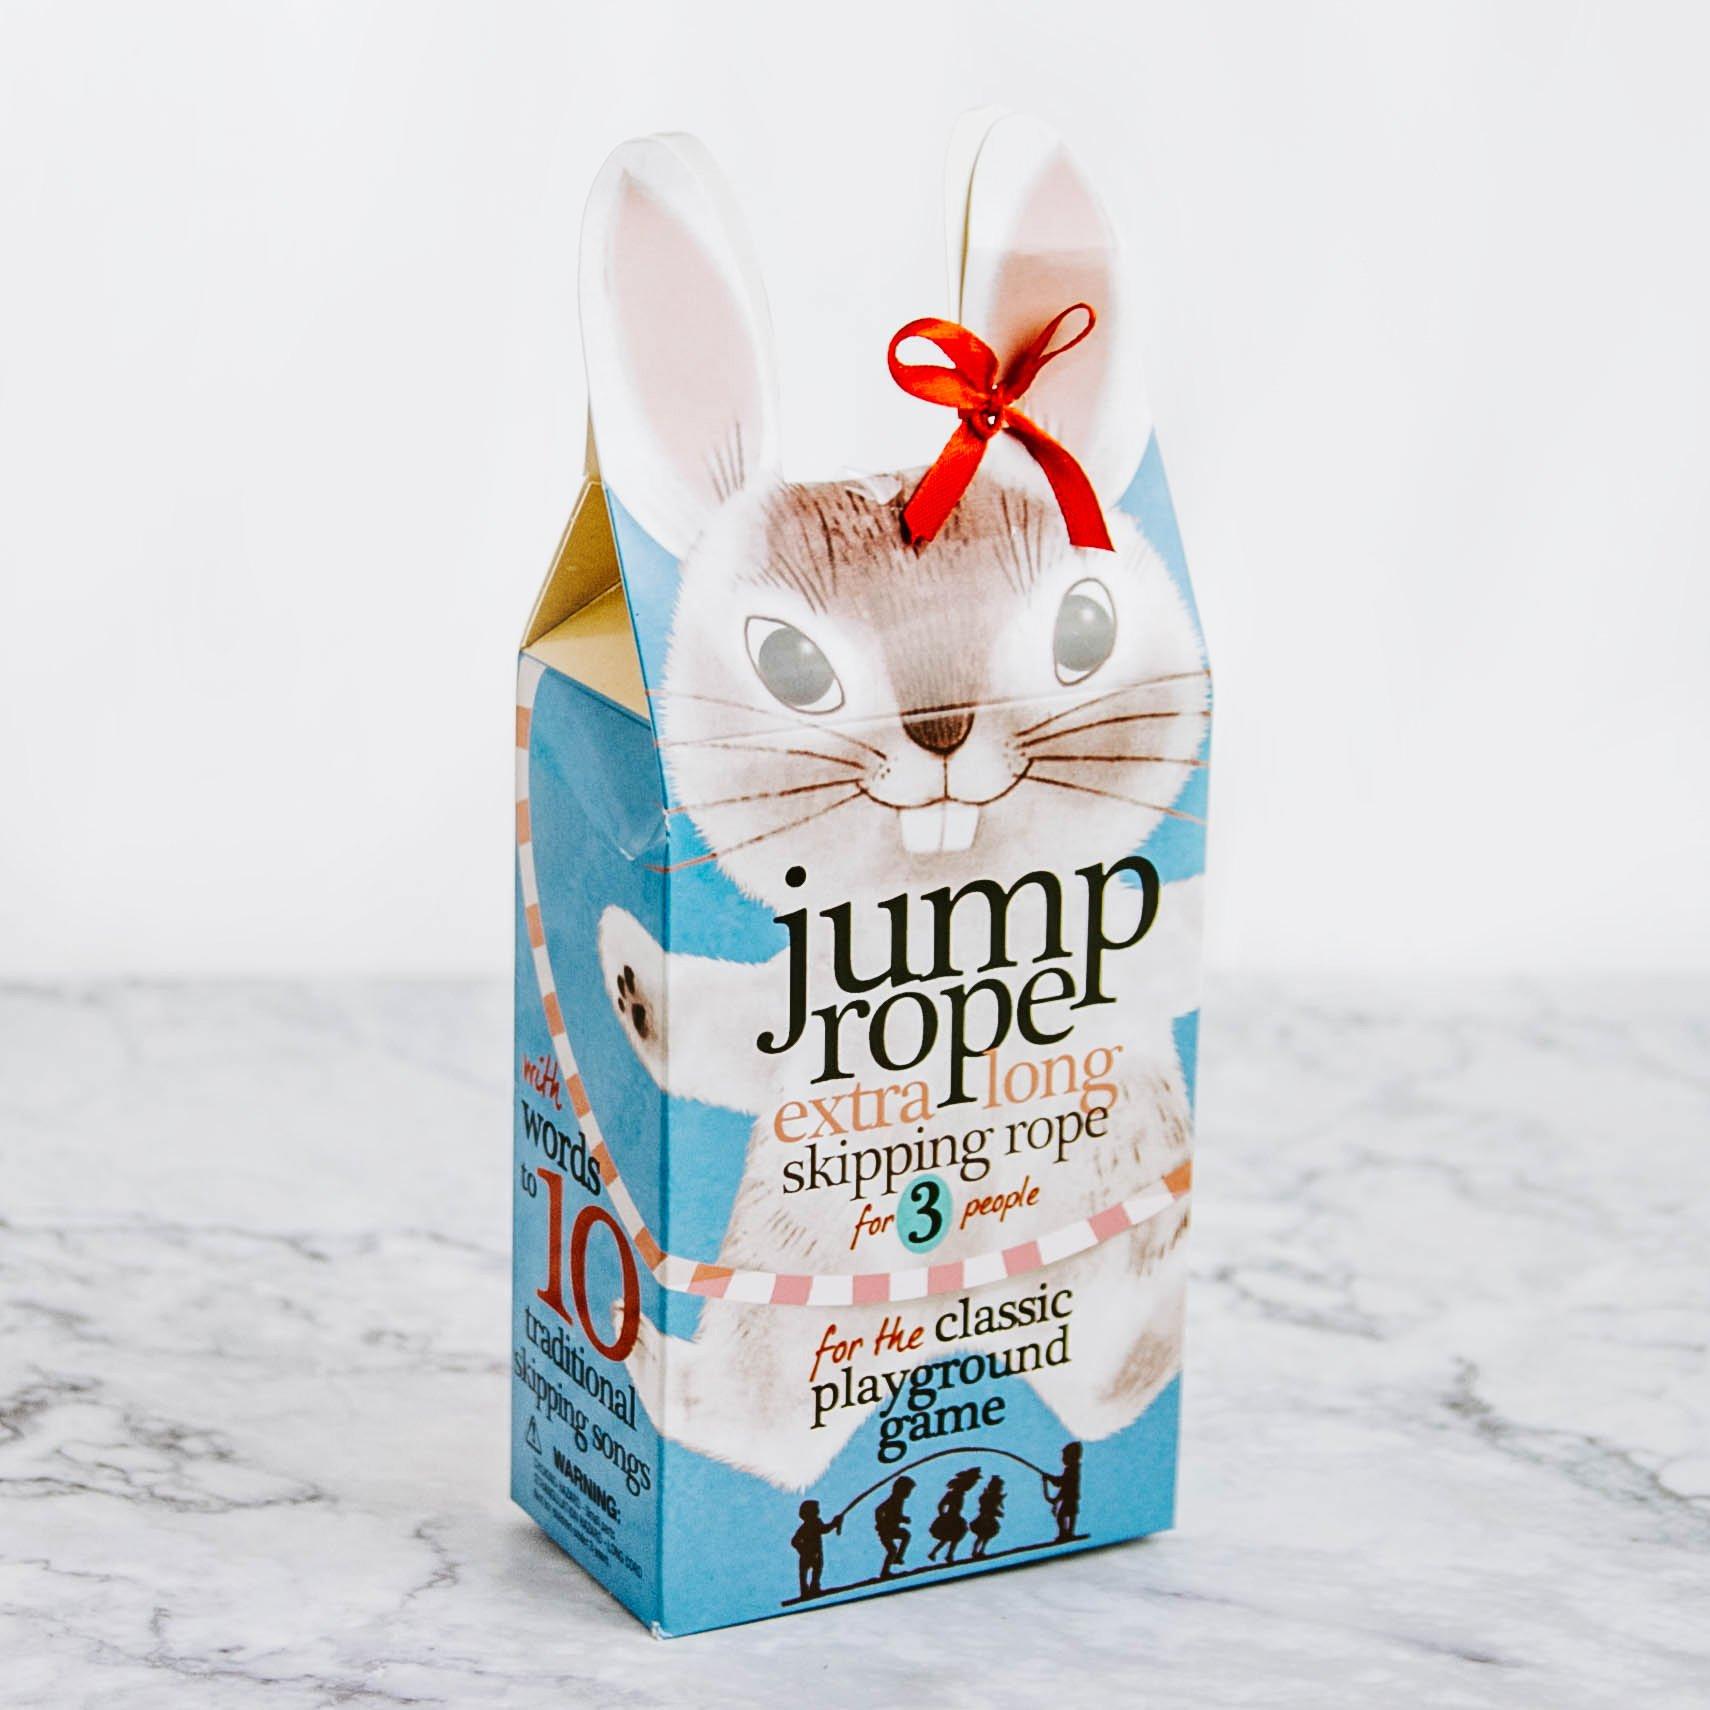 Bunny Jump Rope Bunny jump, Skipping rope, Playground games